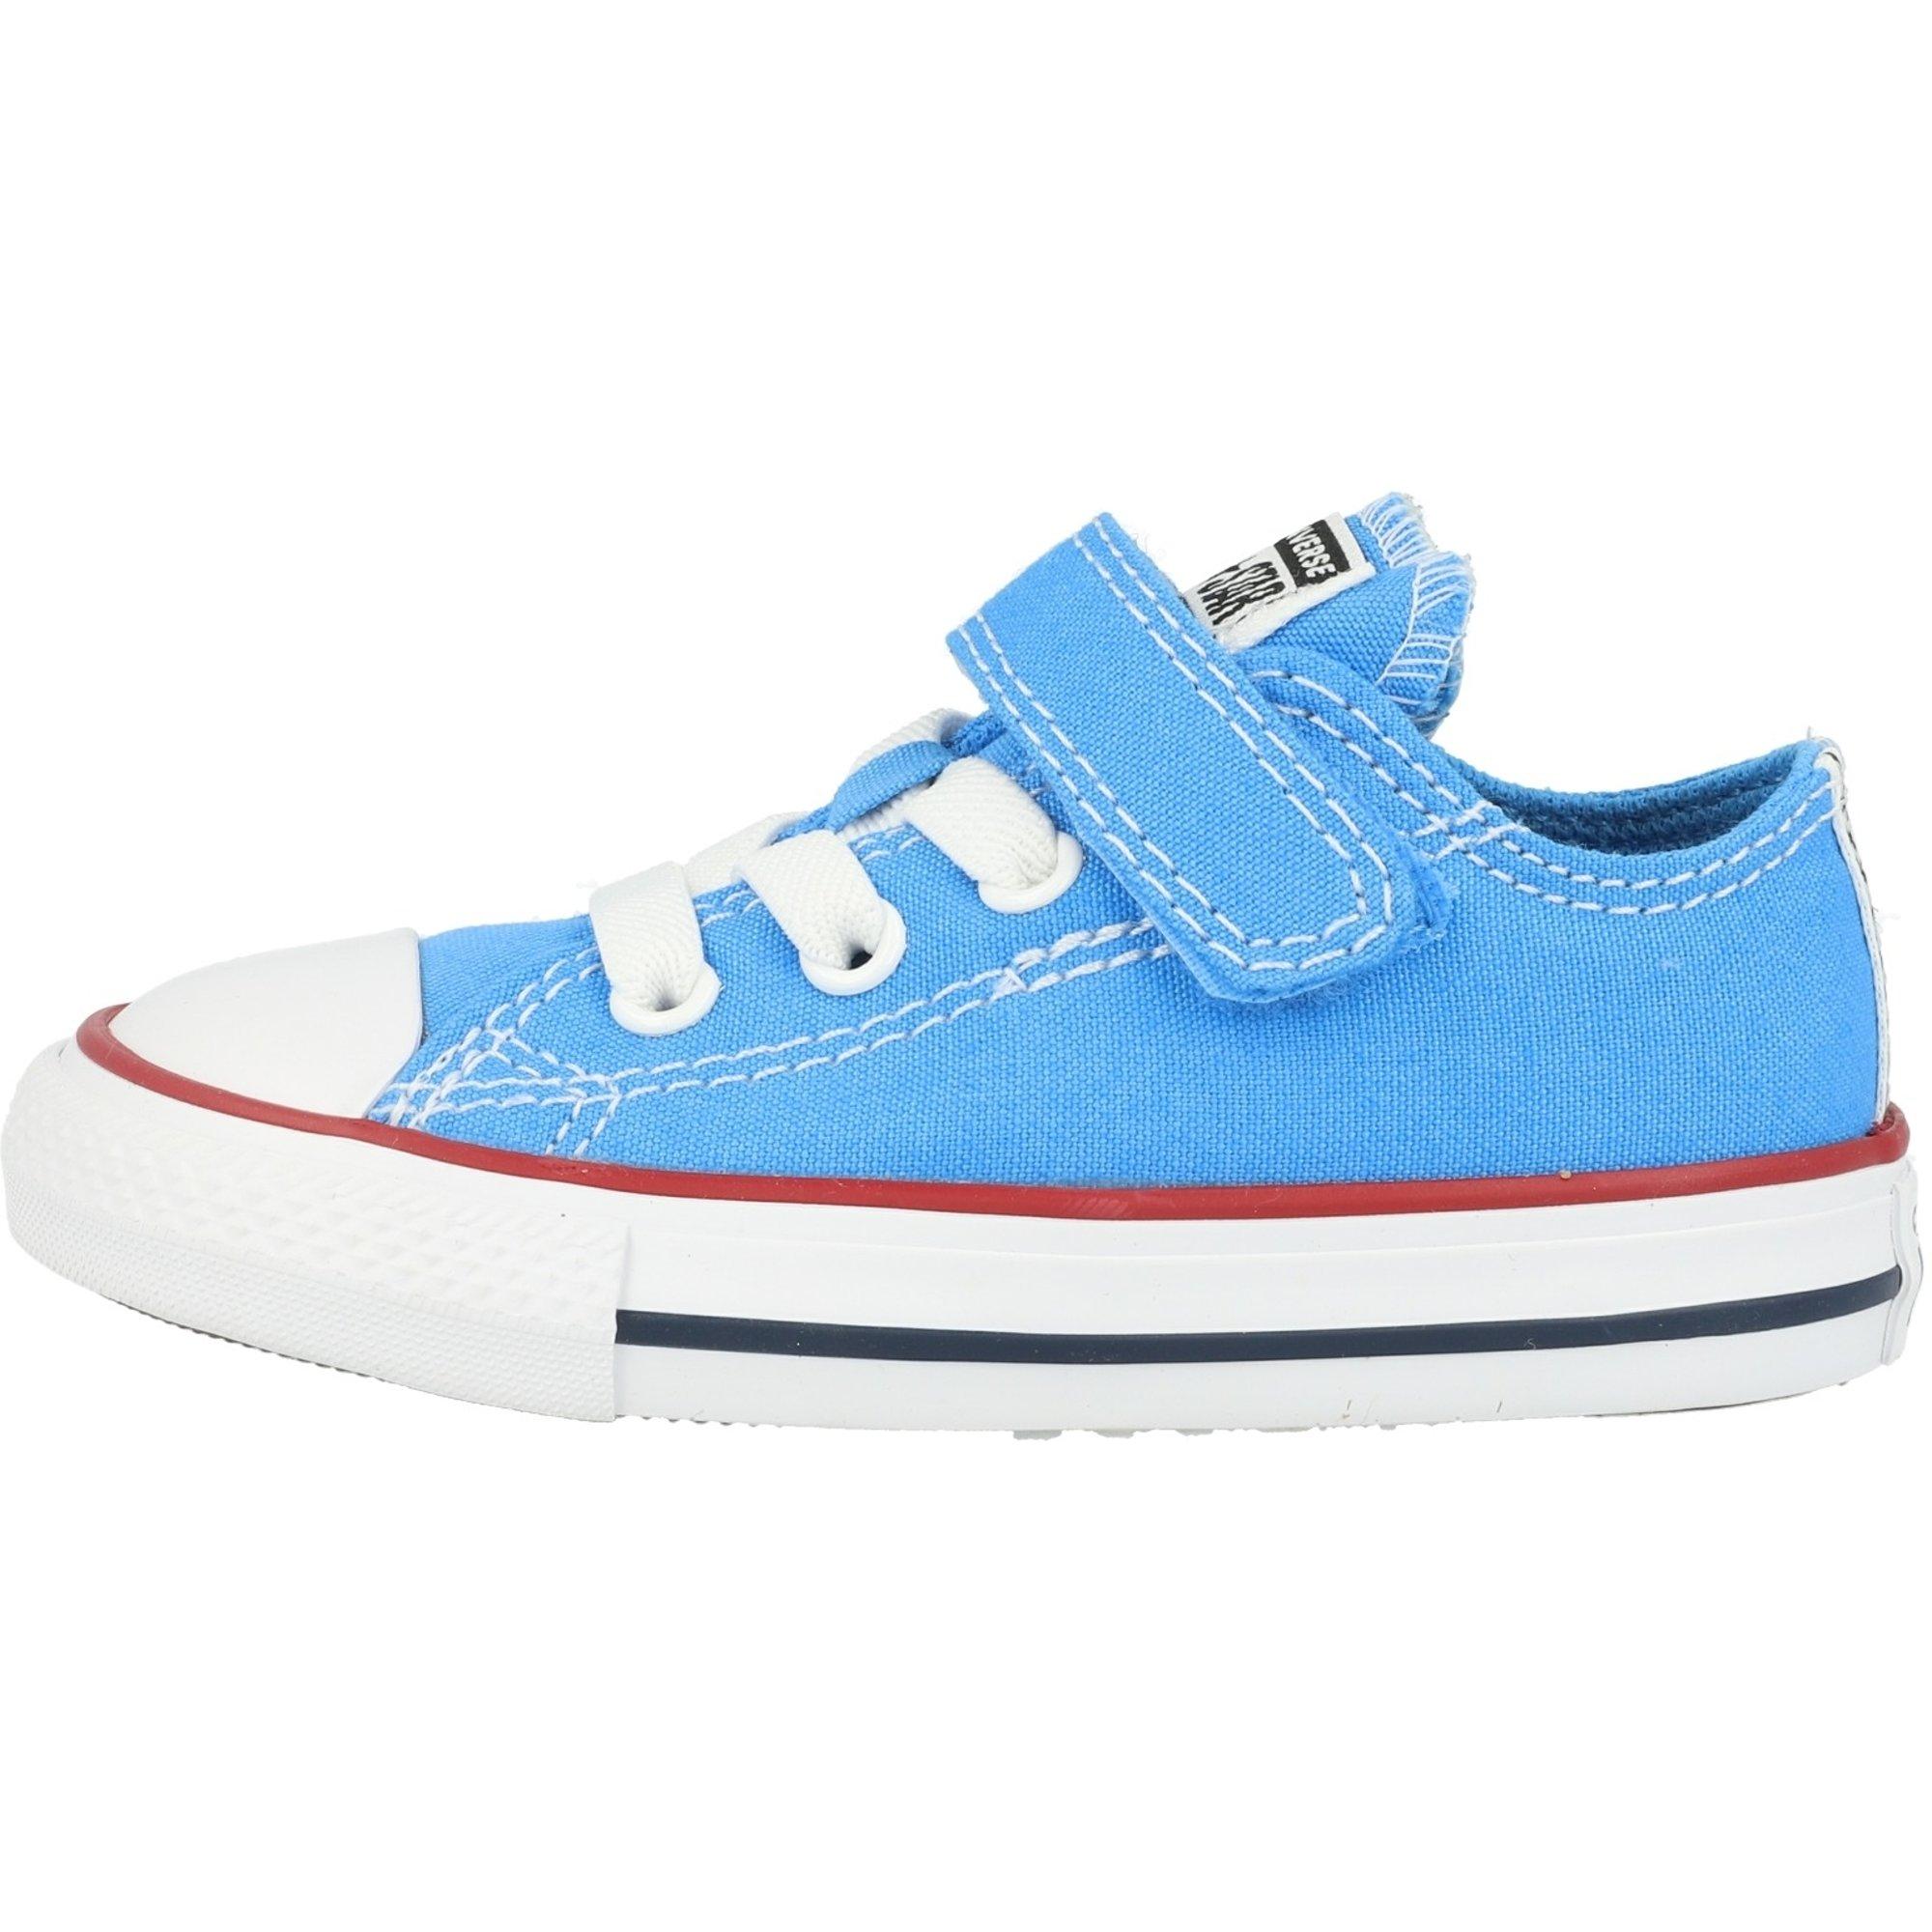 Converse Chuck Taylor All Star 1V Ox Coast/Garnet/White Canvas Baby